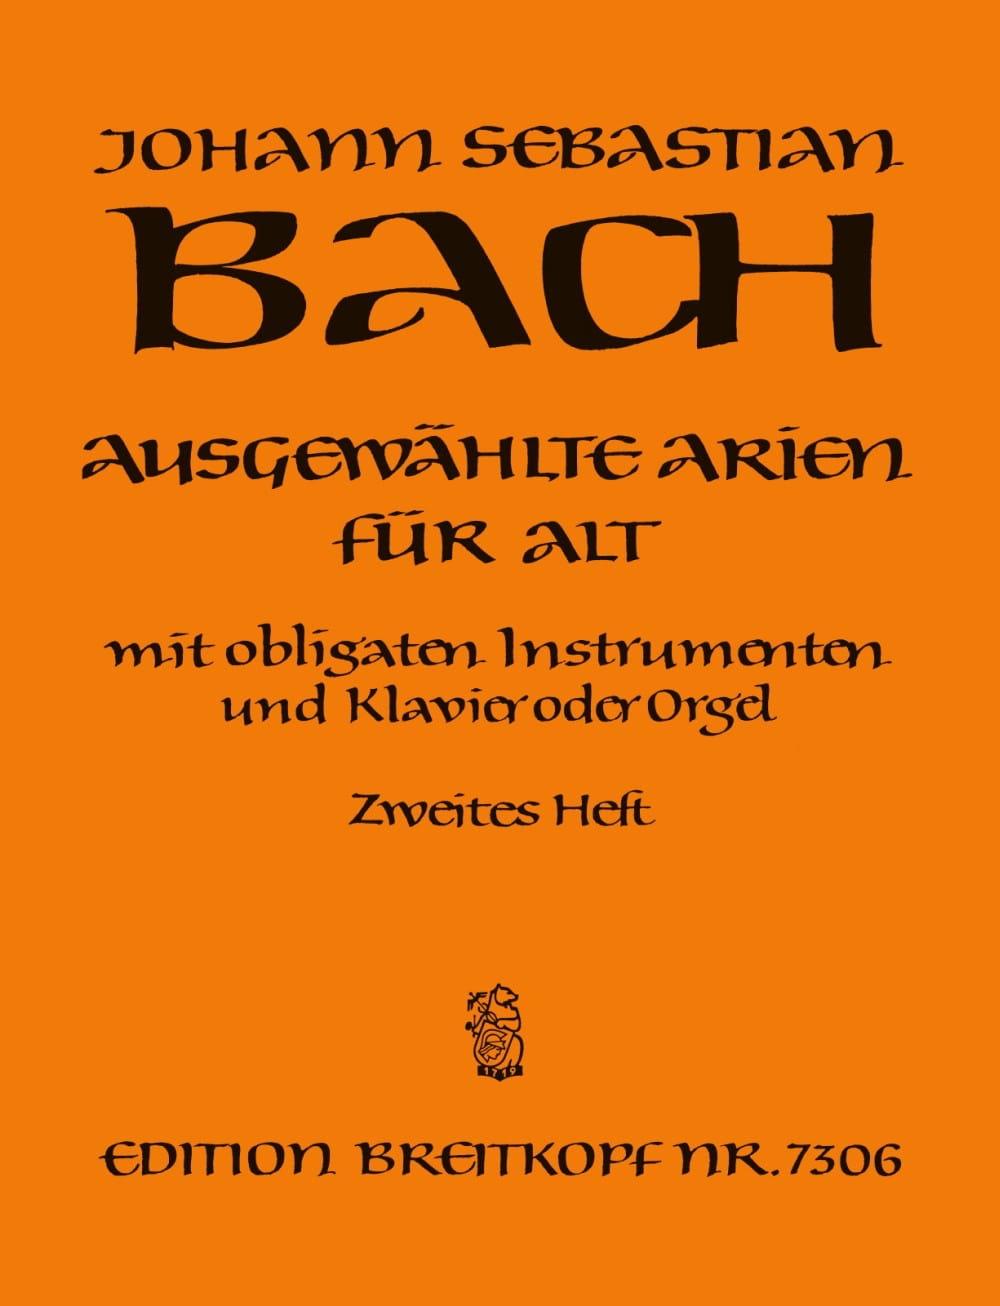 Airs de Cantates Alto Volume 2 - BACH - Partition - laflutedepan.com